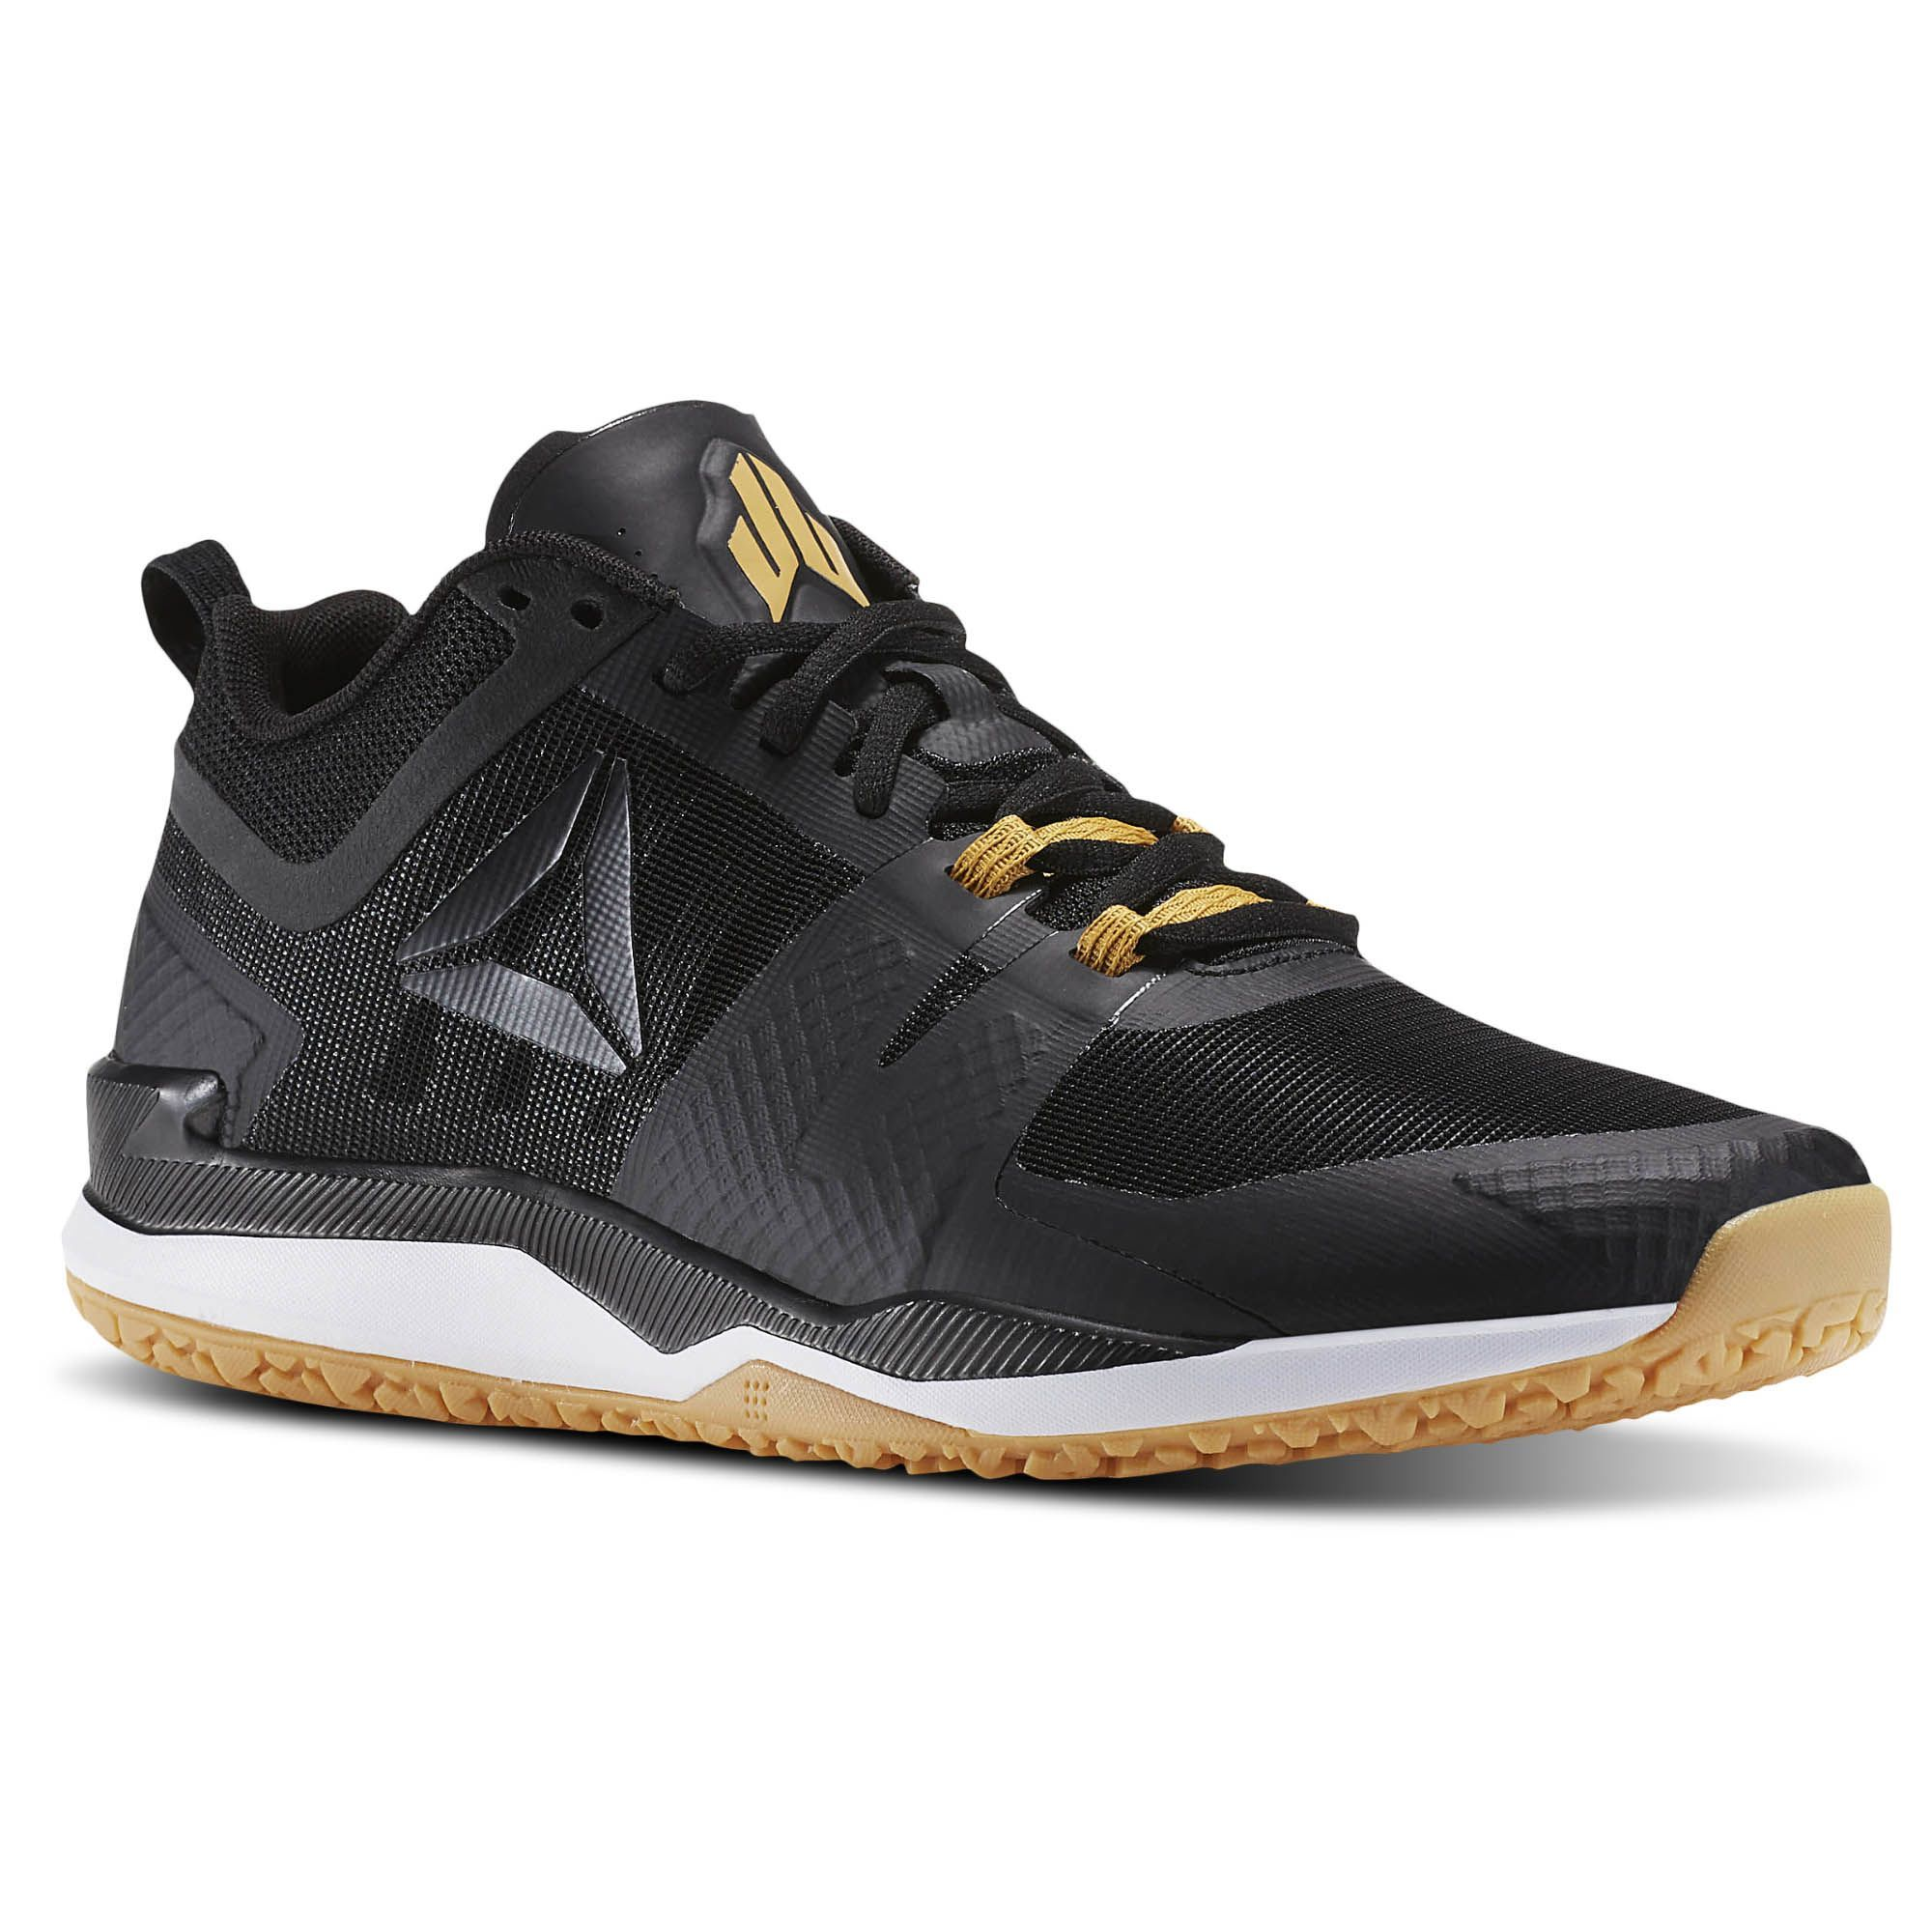 span itempropnameNike Air Max 90 Mid NO SEW Army GreenEarthy Yellow Mens Running Shoesspan